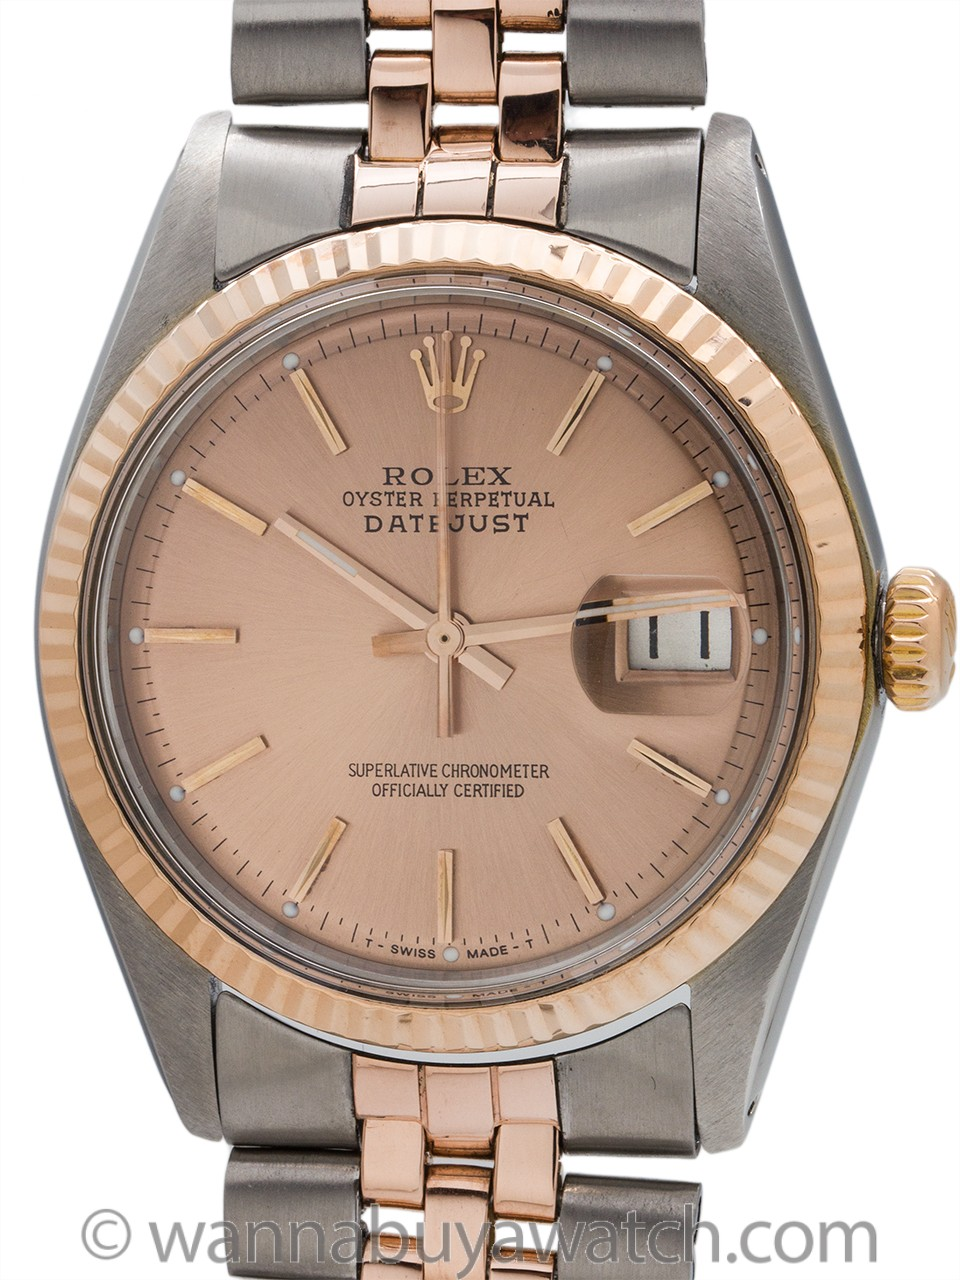 Rolex SS/14K Rose Gold Datejust ref 1601 circa 1974